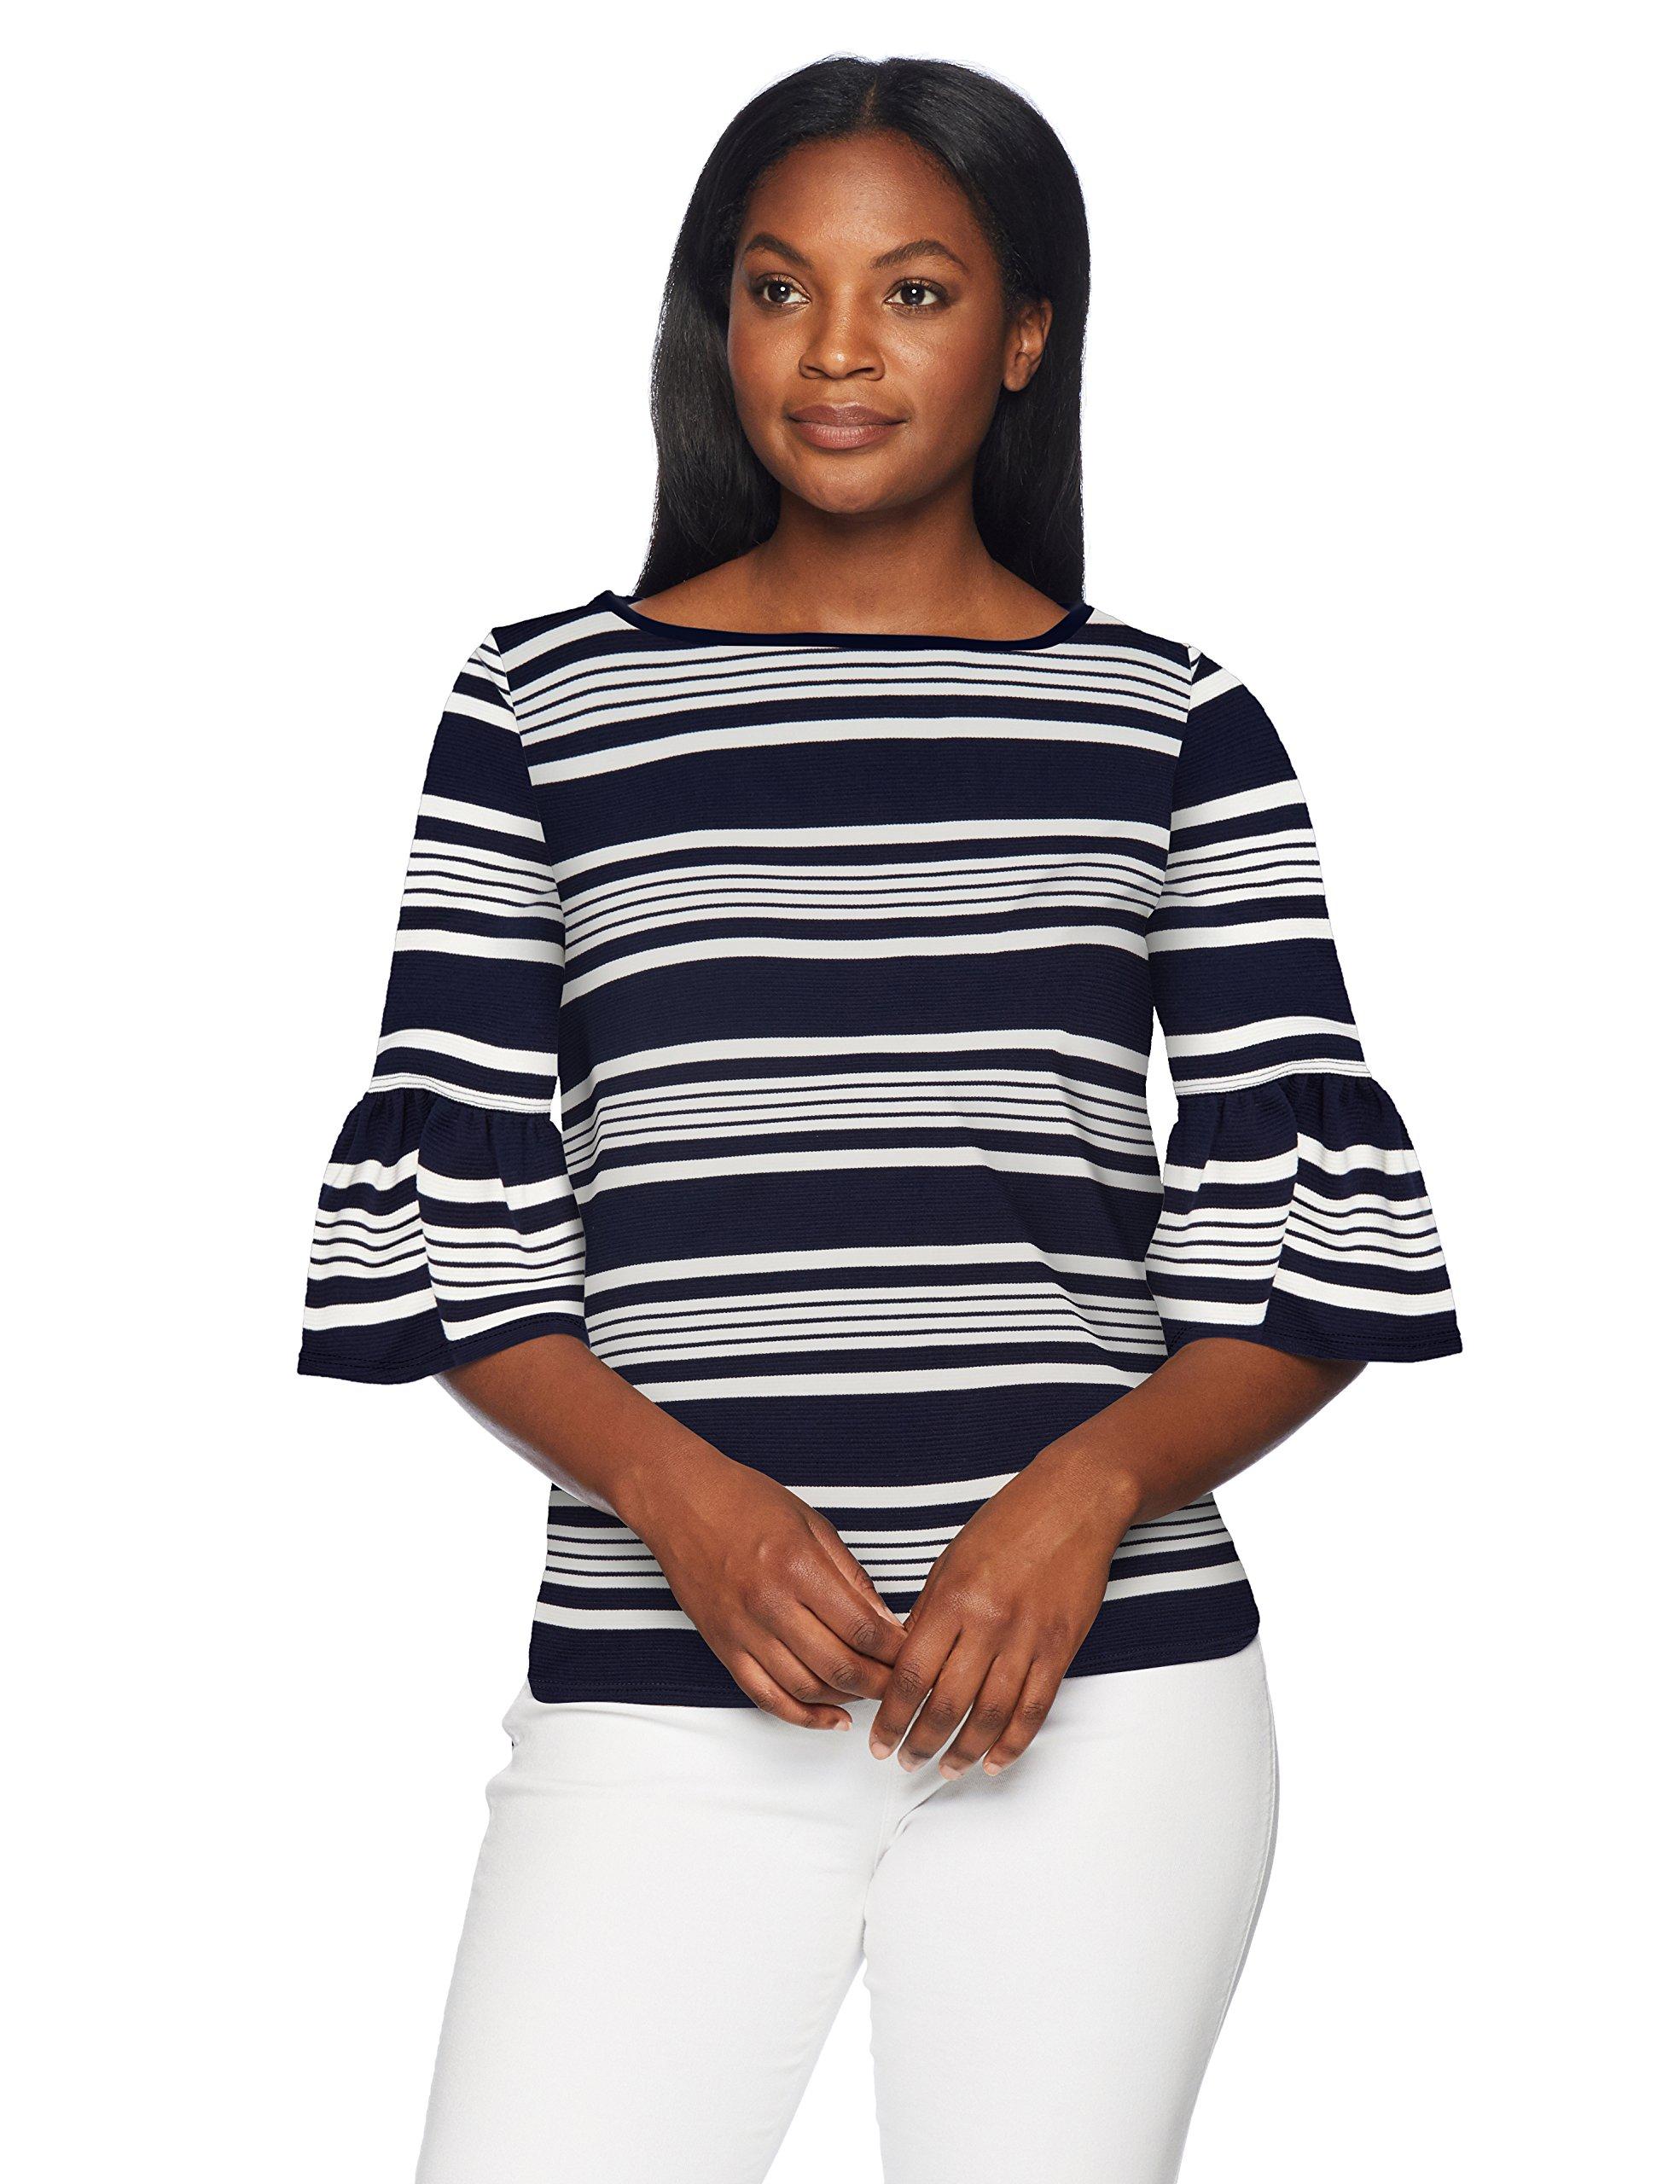 Lark & Ro Women's Standard Tulip Sleeve Top, Navy/Ivory Wide Box Stripe, L